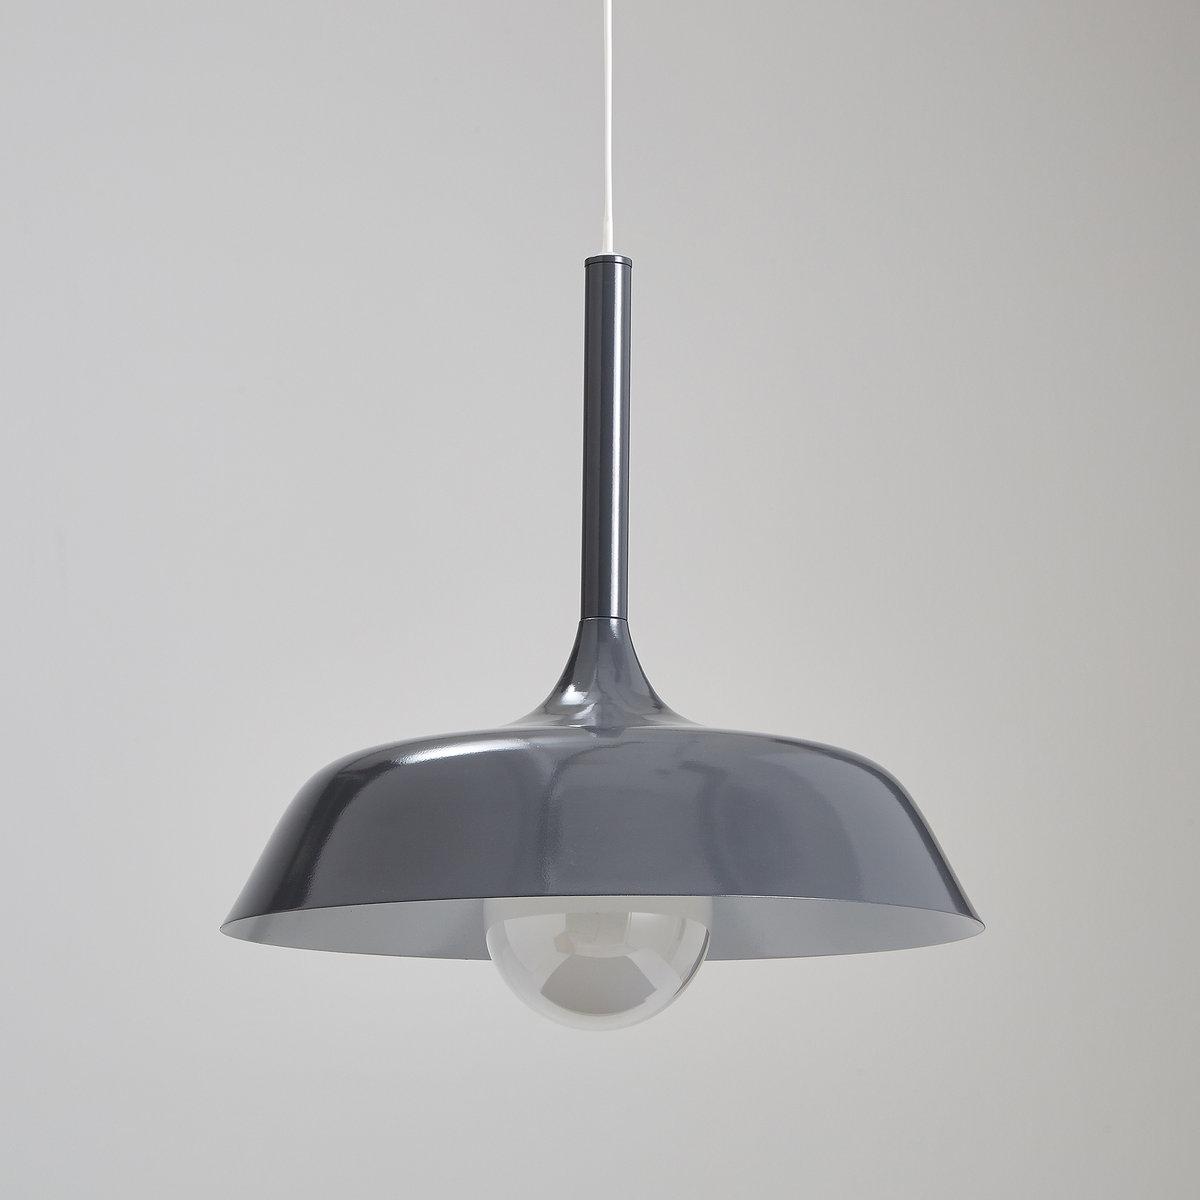 Светильник из металла, Miaka от La Redoute